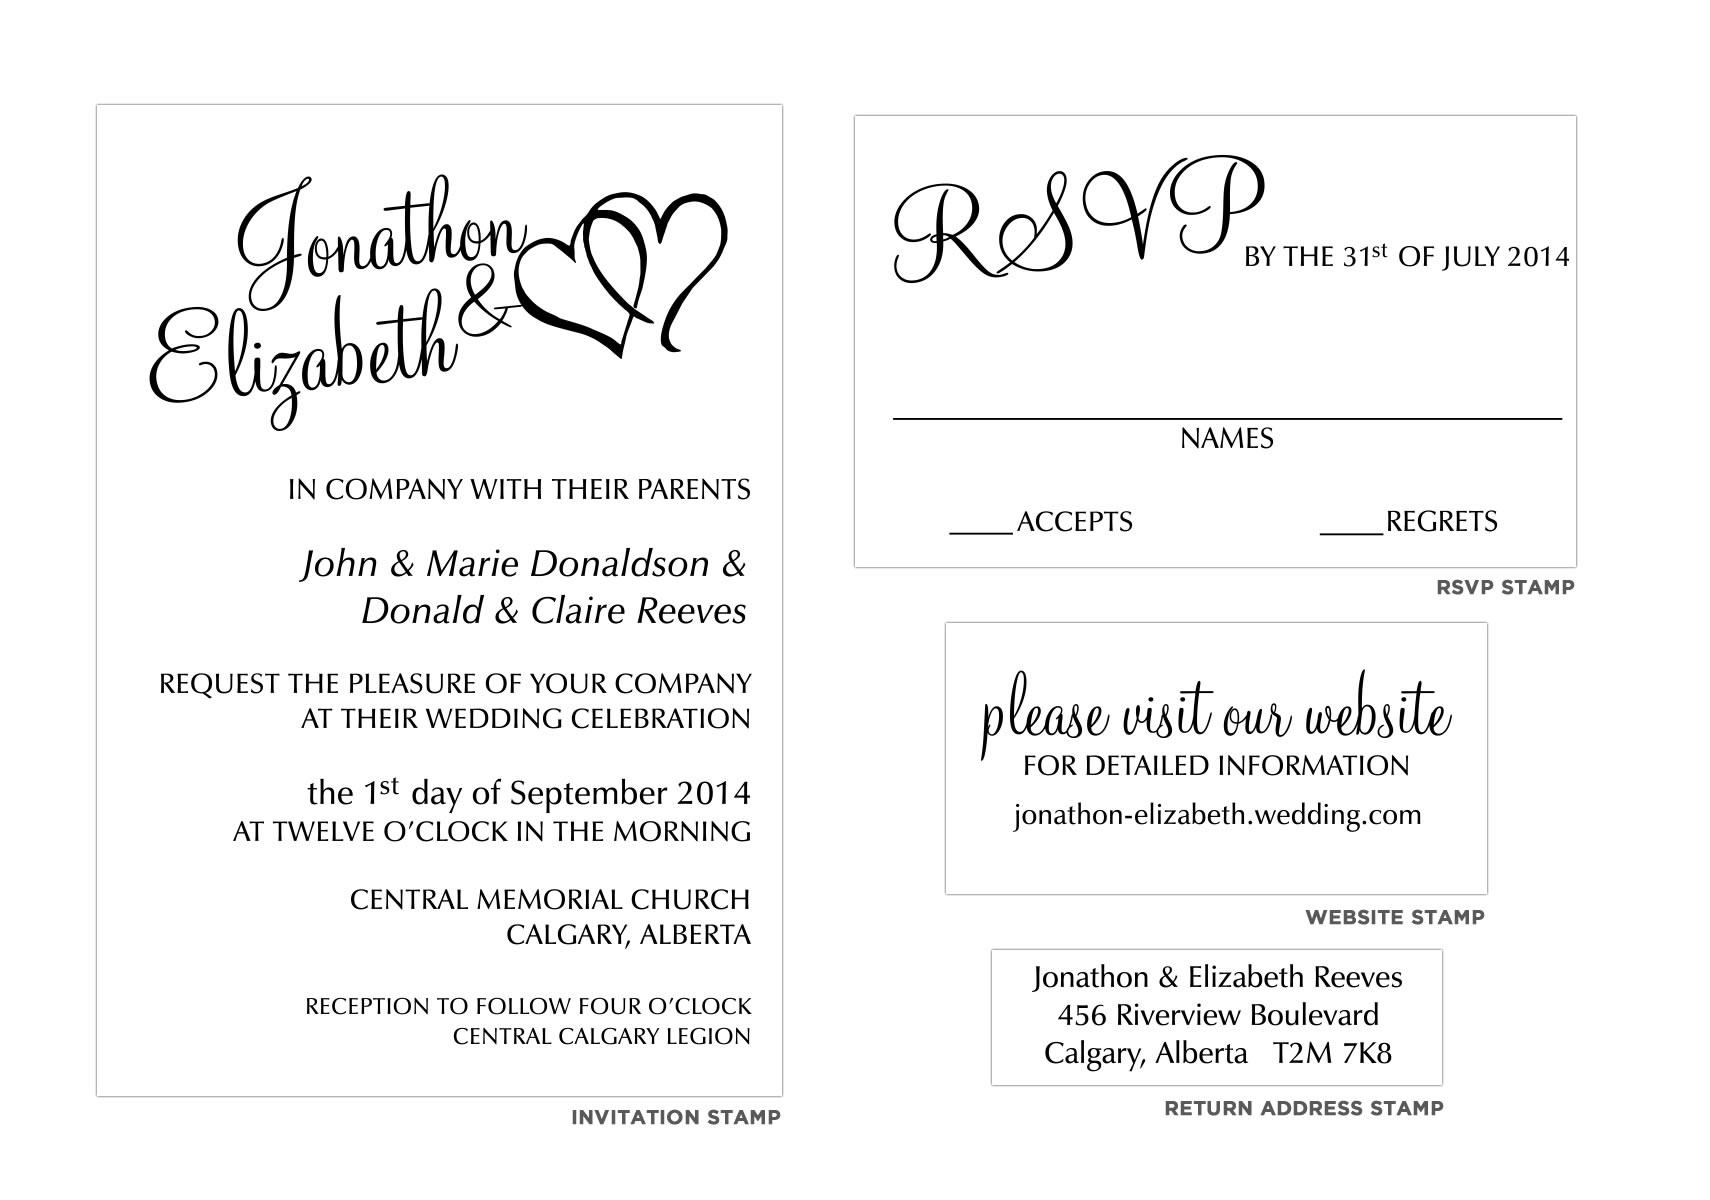 calligraphy wedding invitation stamp set wedding invitation stamps Calligraphy Wedding Invitation Stamp Set